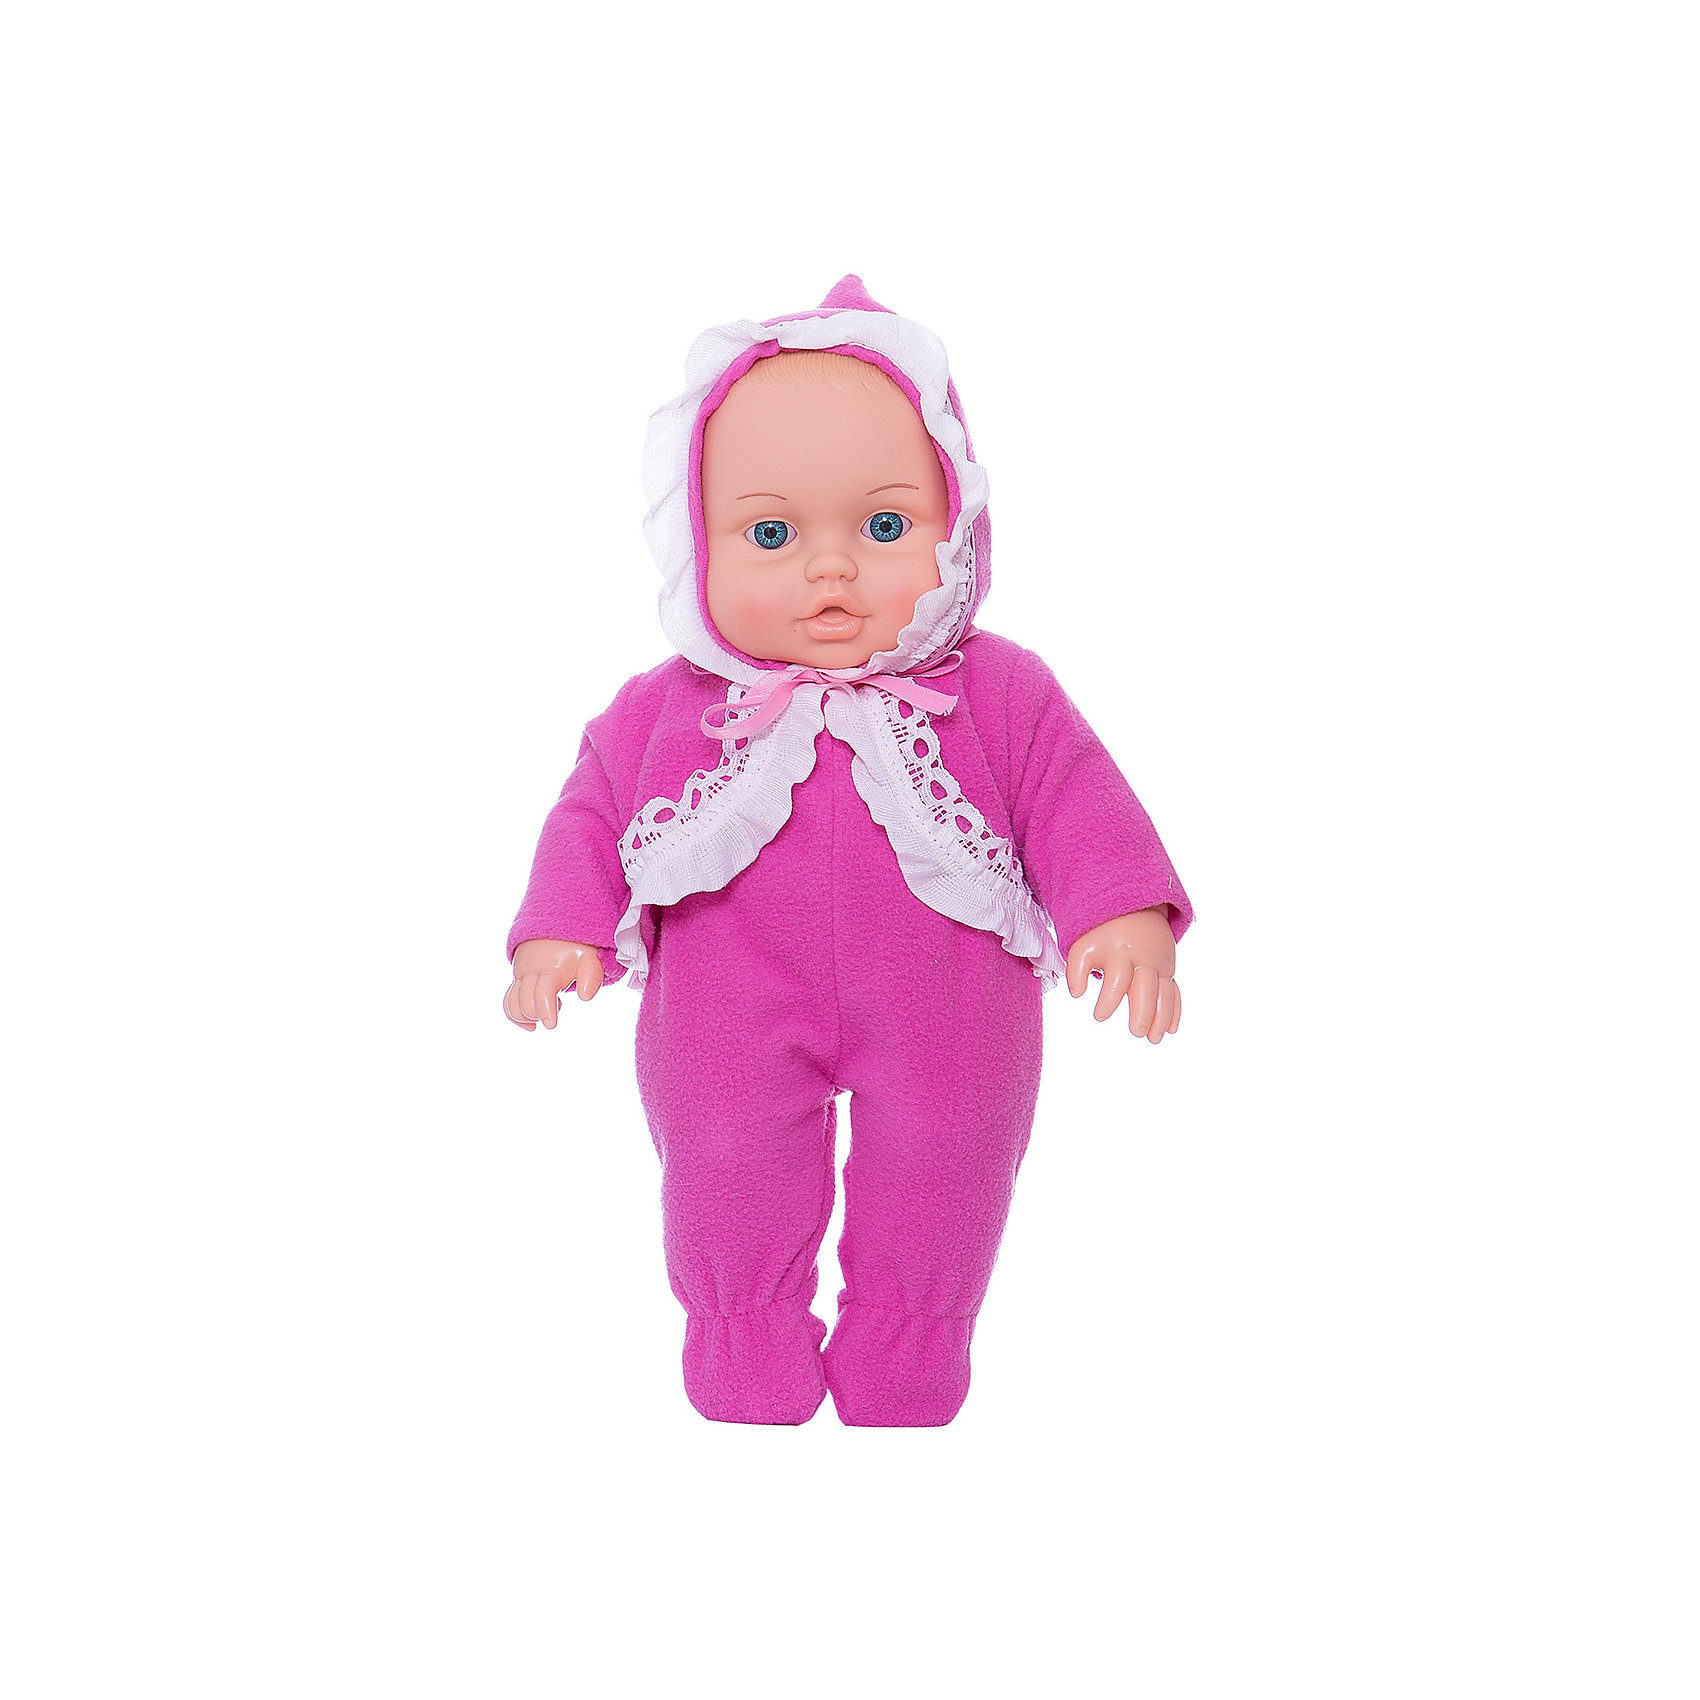 Кукла Малышка 1 (девочка), 35,5 см, ВеснаКлассические куклы<br><br><br>Ширина мм: 170<br>Глубина мм: 100<br>Высота мм: 370<br>Вес г: 460<br>Возраст от месяцев: 36<br>Возраст до месяцев: 144<br>Пол: Женский<br>Возраст: Детский<br>SKU: 4896491